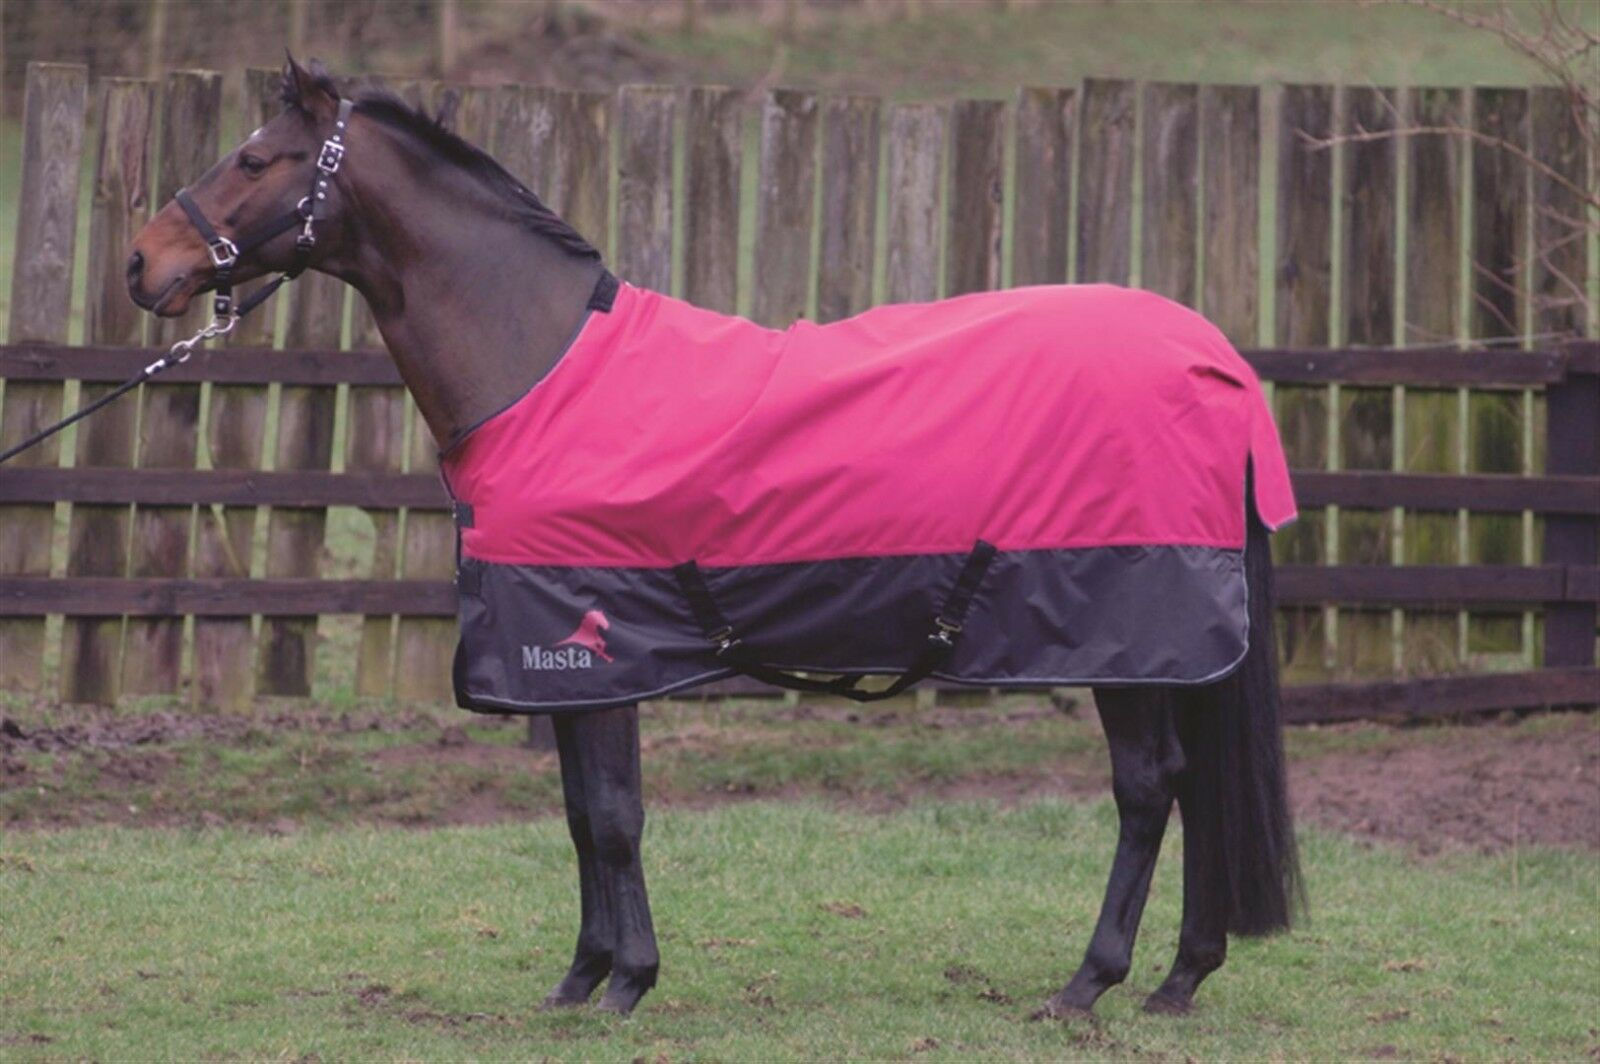 Masta Avante 340g 600 Denier Winter Heavyweight Heavyweight Heavyweight Horse Turnout Rug Blanket bac927